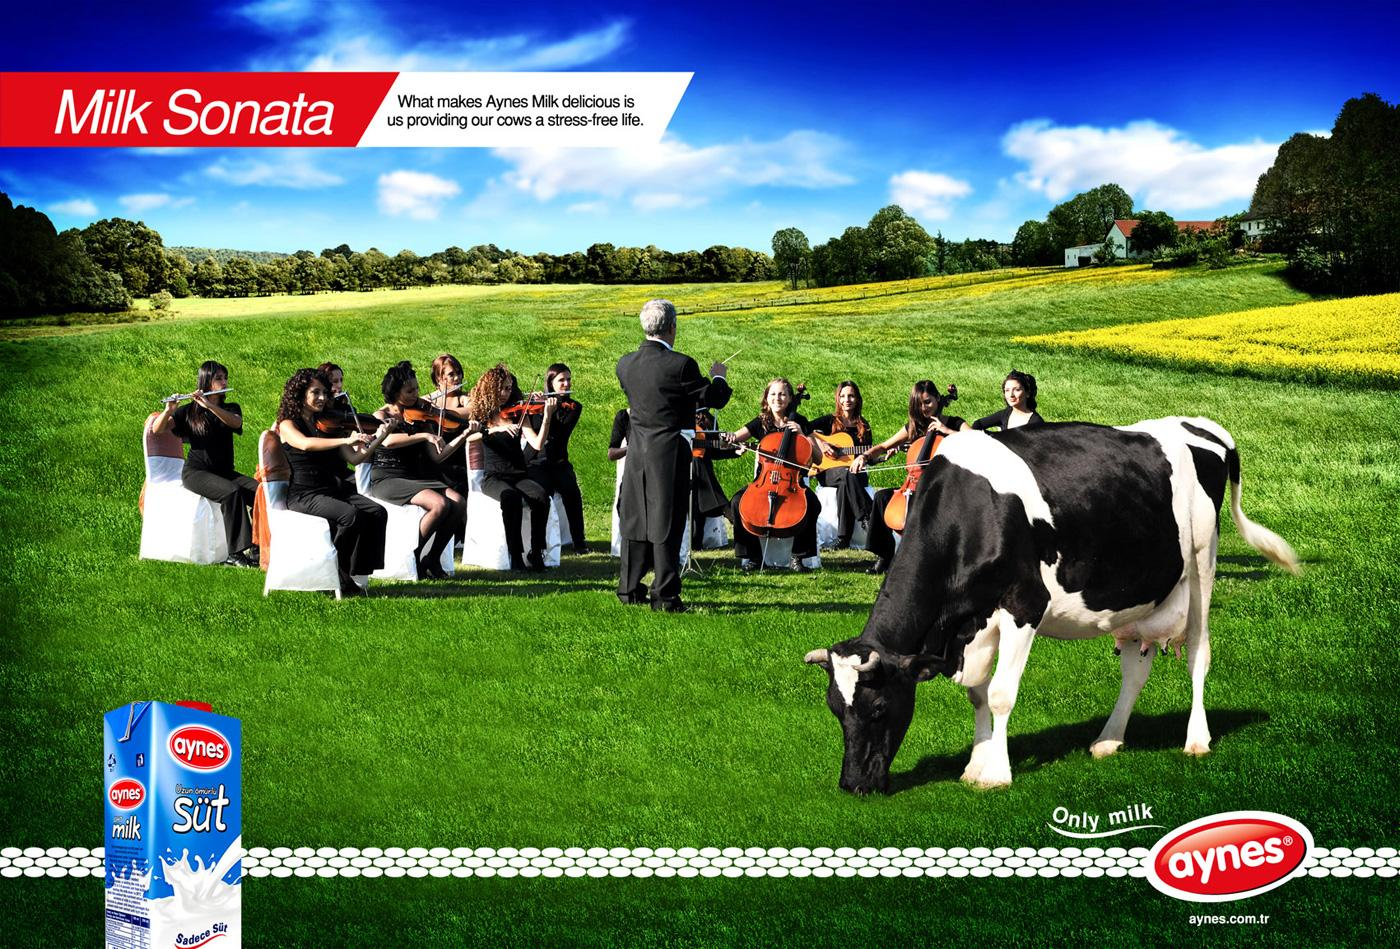 Aynes Print Ad -  Milk sonata